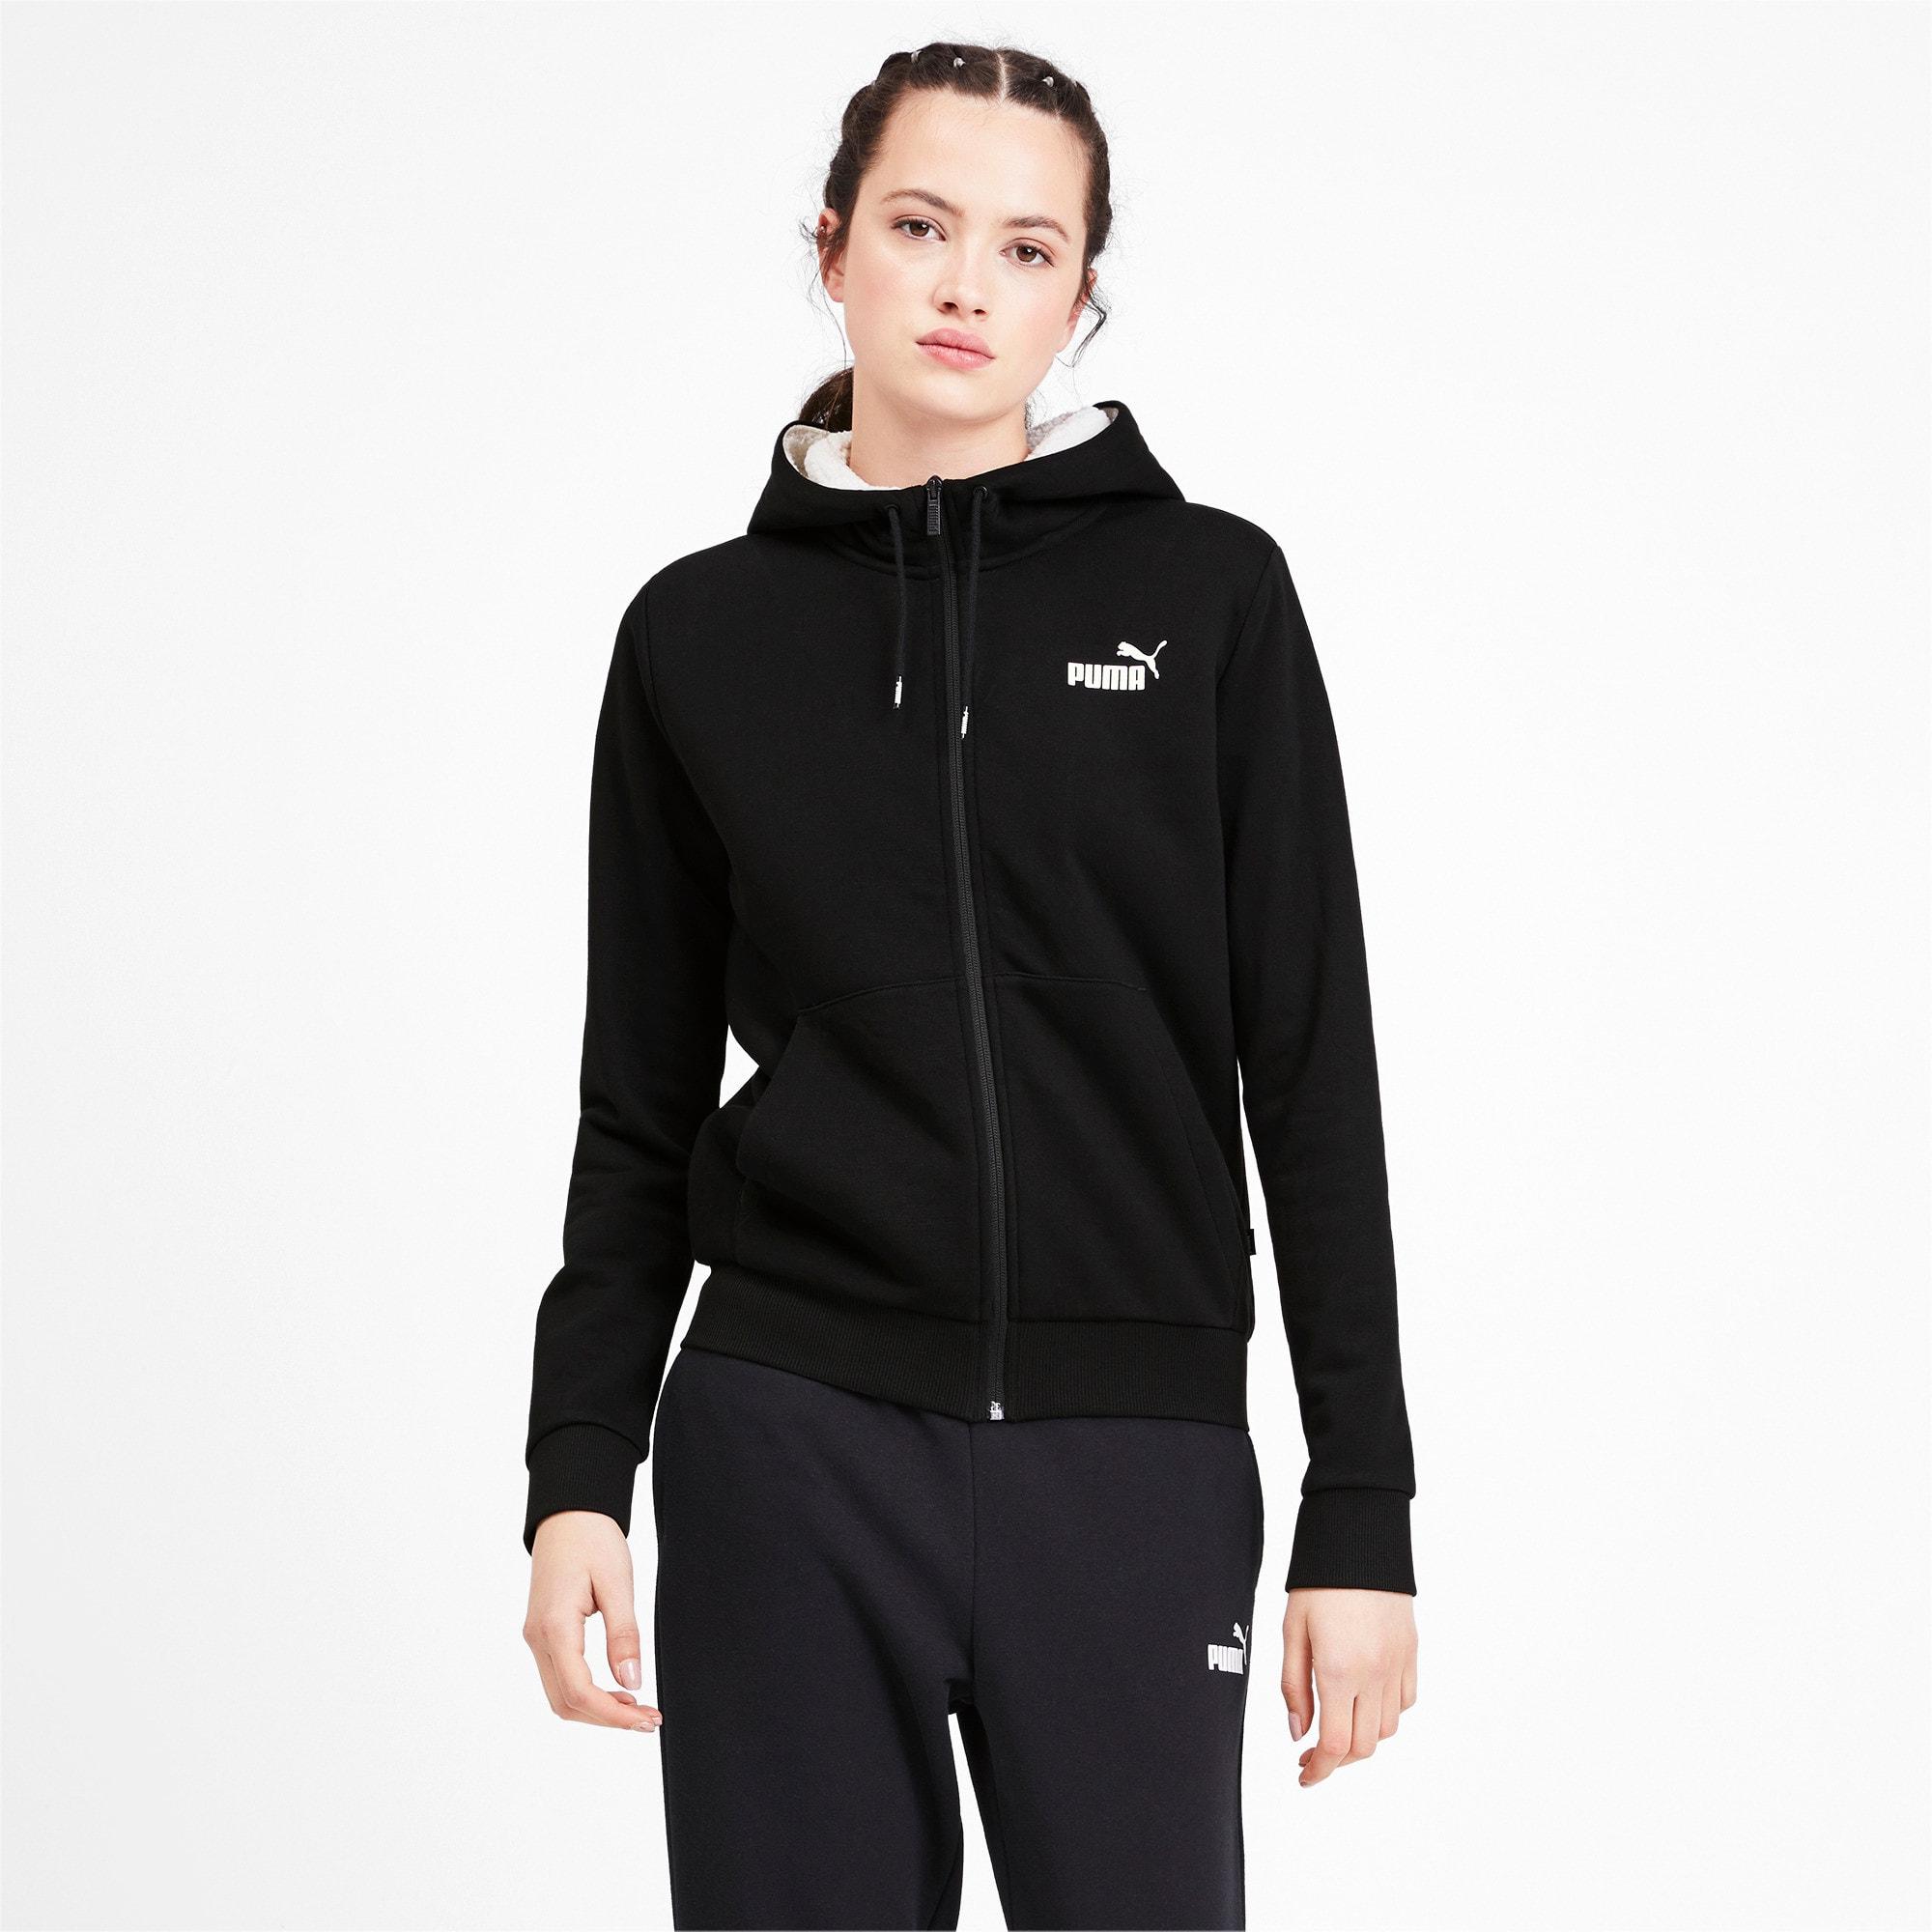 Miniatura 1 de Chaqueta con capucha Essentials + Sherpa para mujer, Cotton Black, mediano